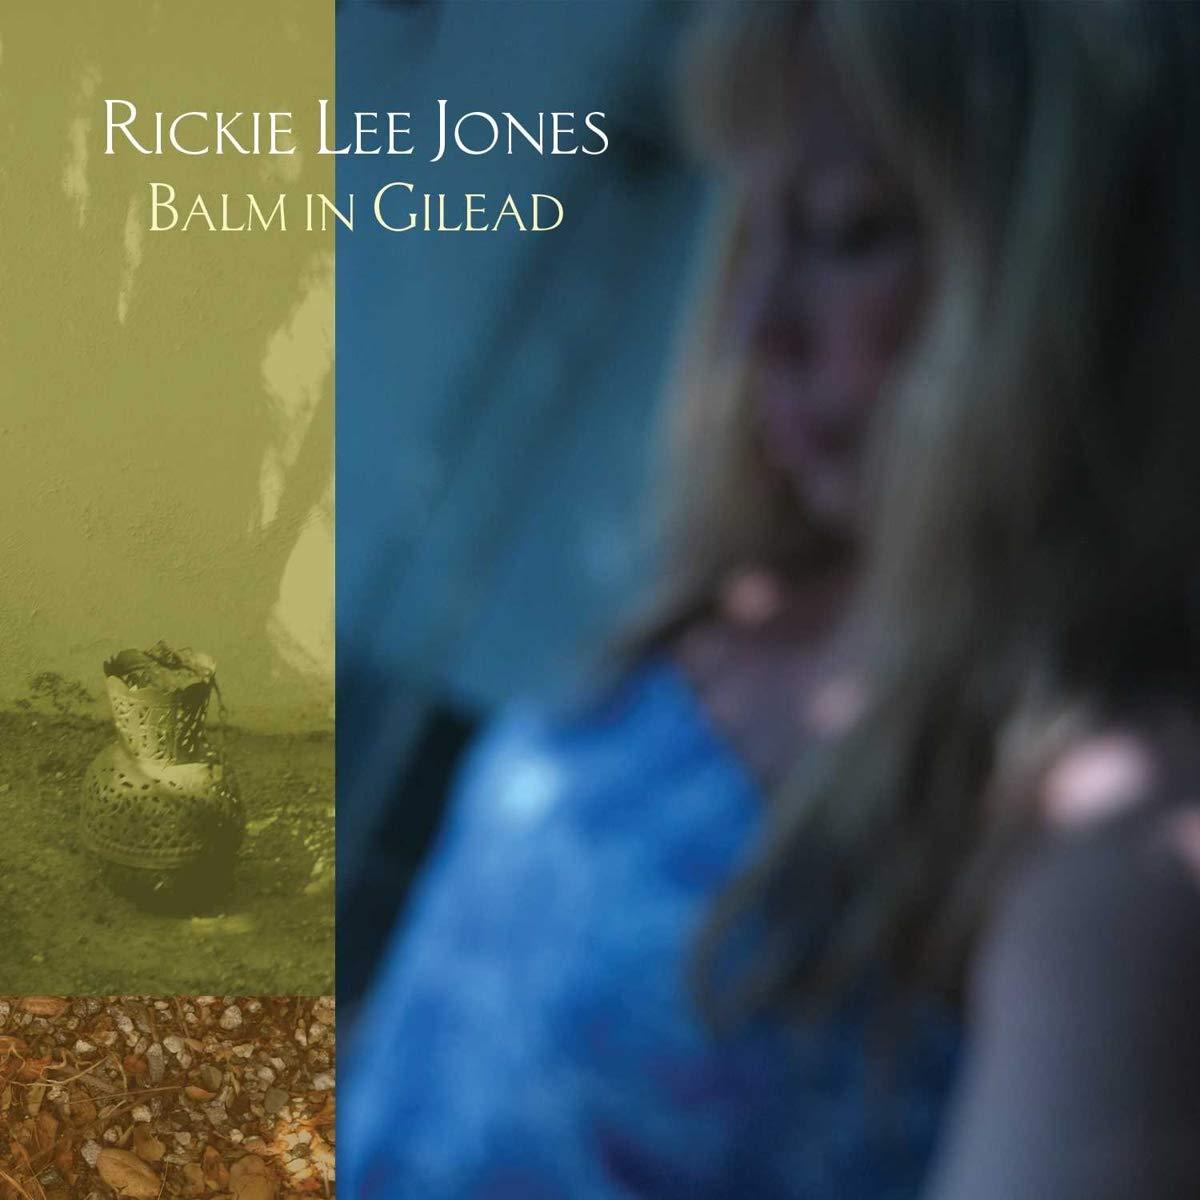 Rickie Lee Jones – Balm In Gilead (2009) [FLAC]